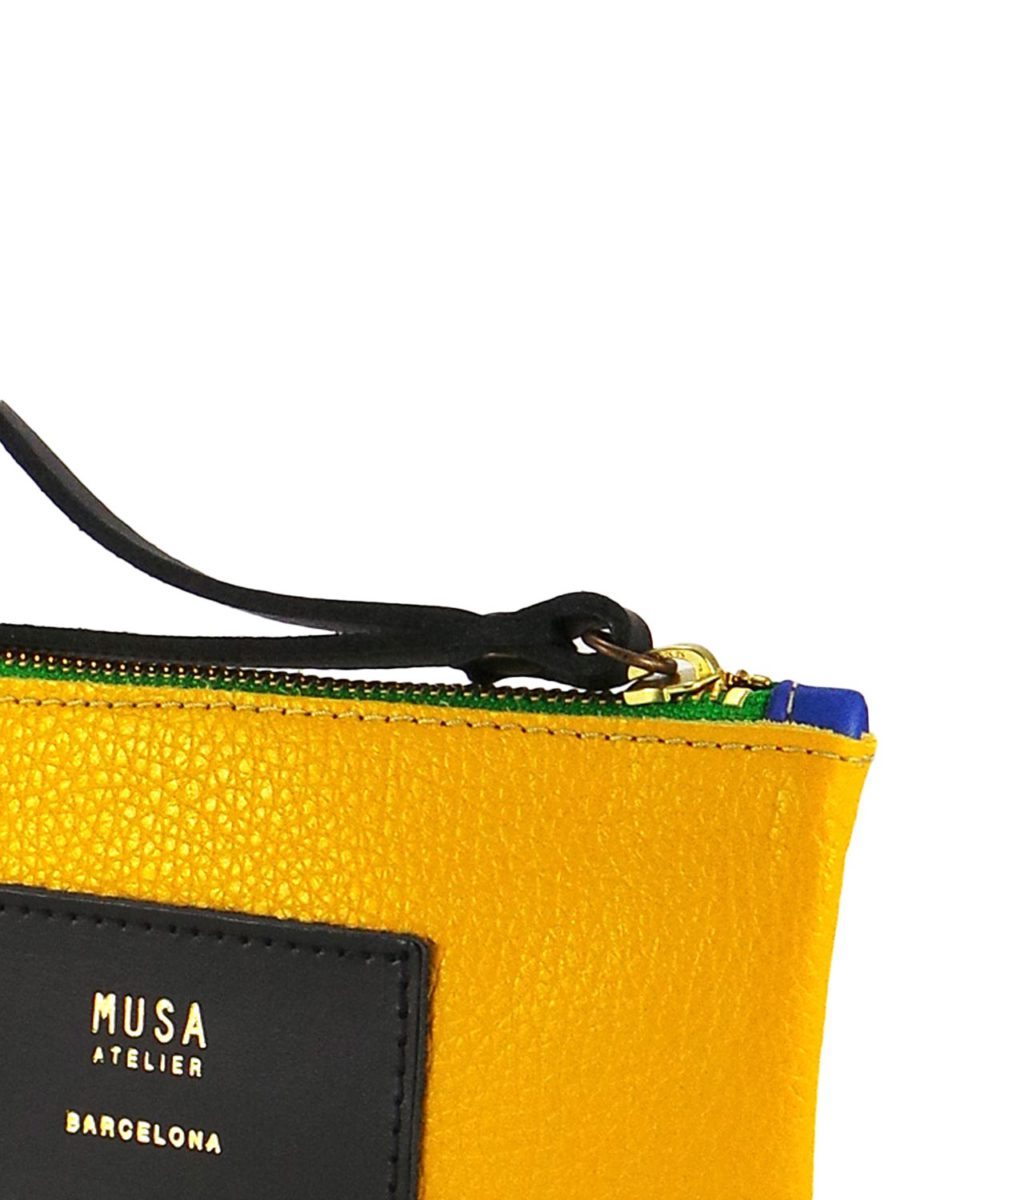 bolso musa amarillo detalle